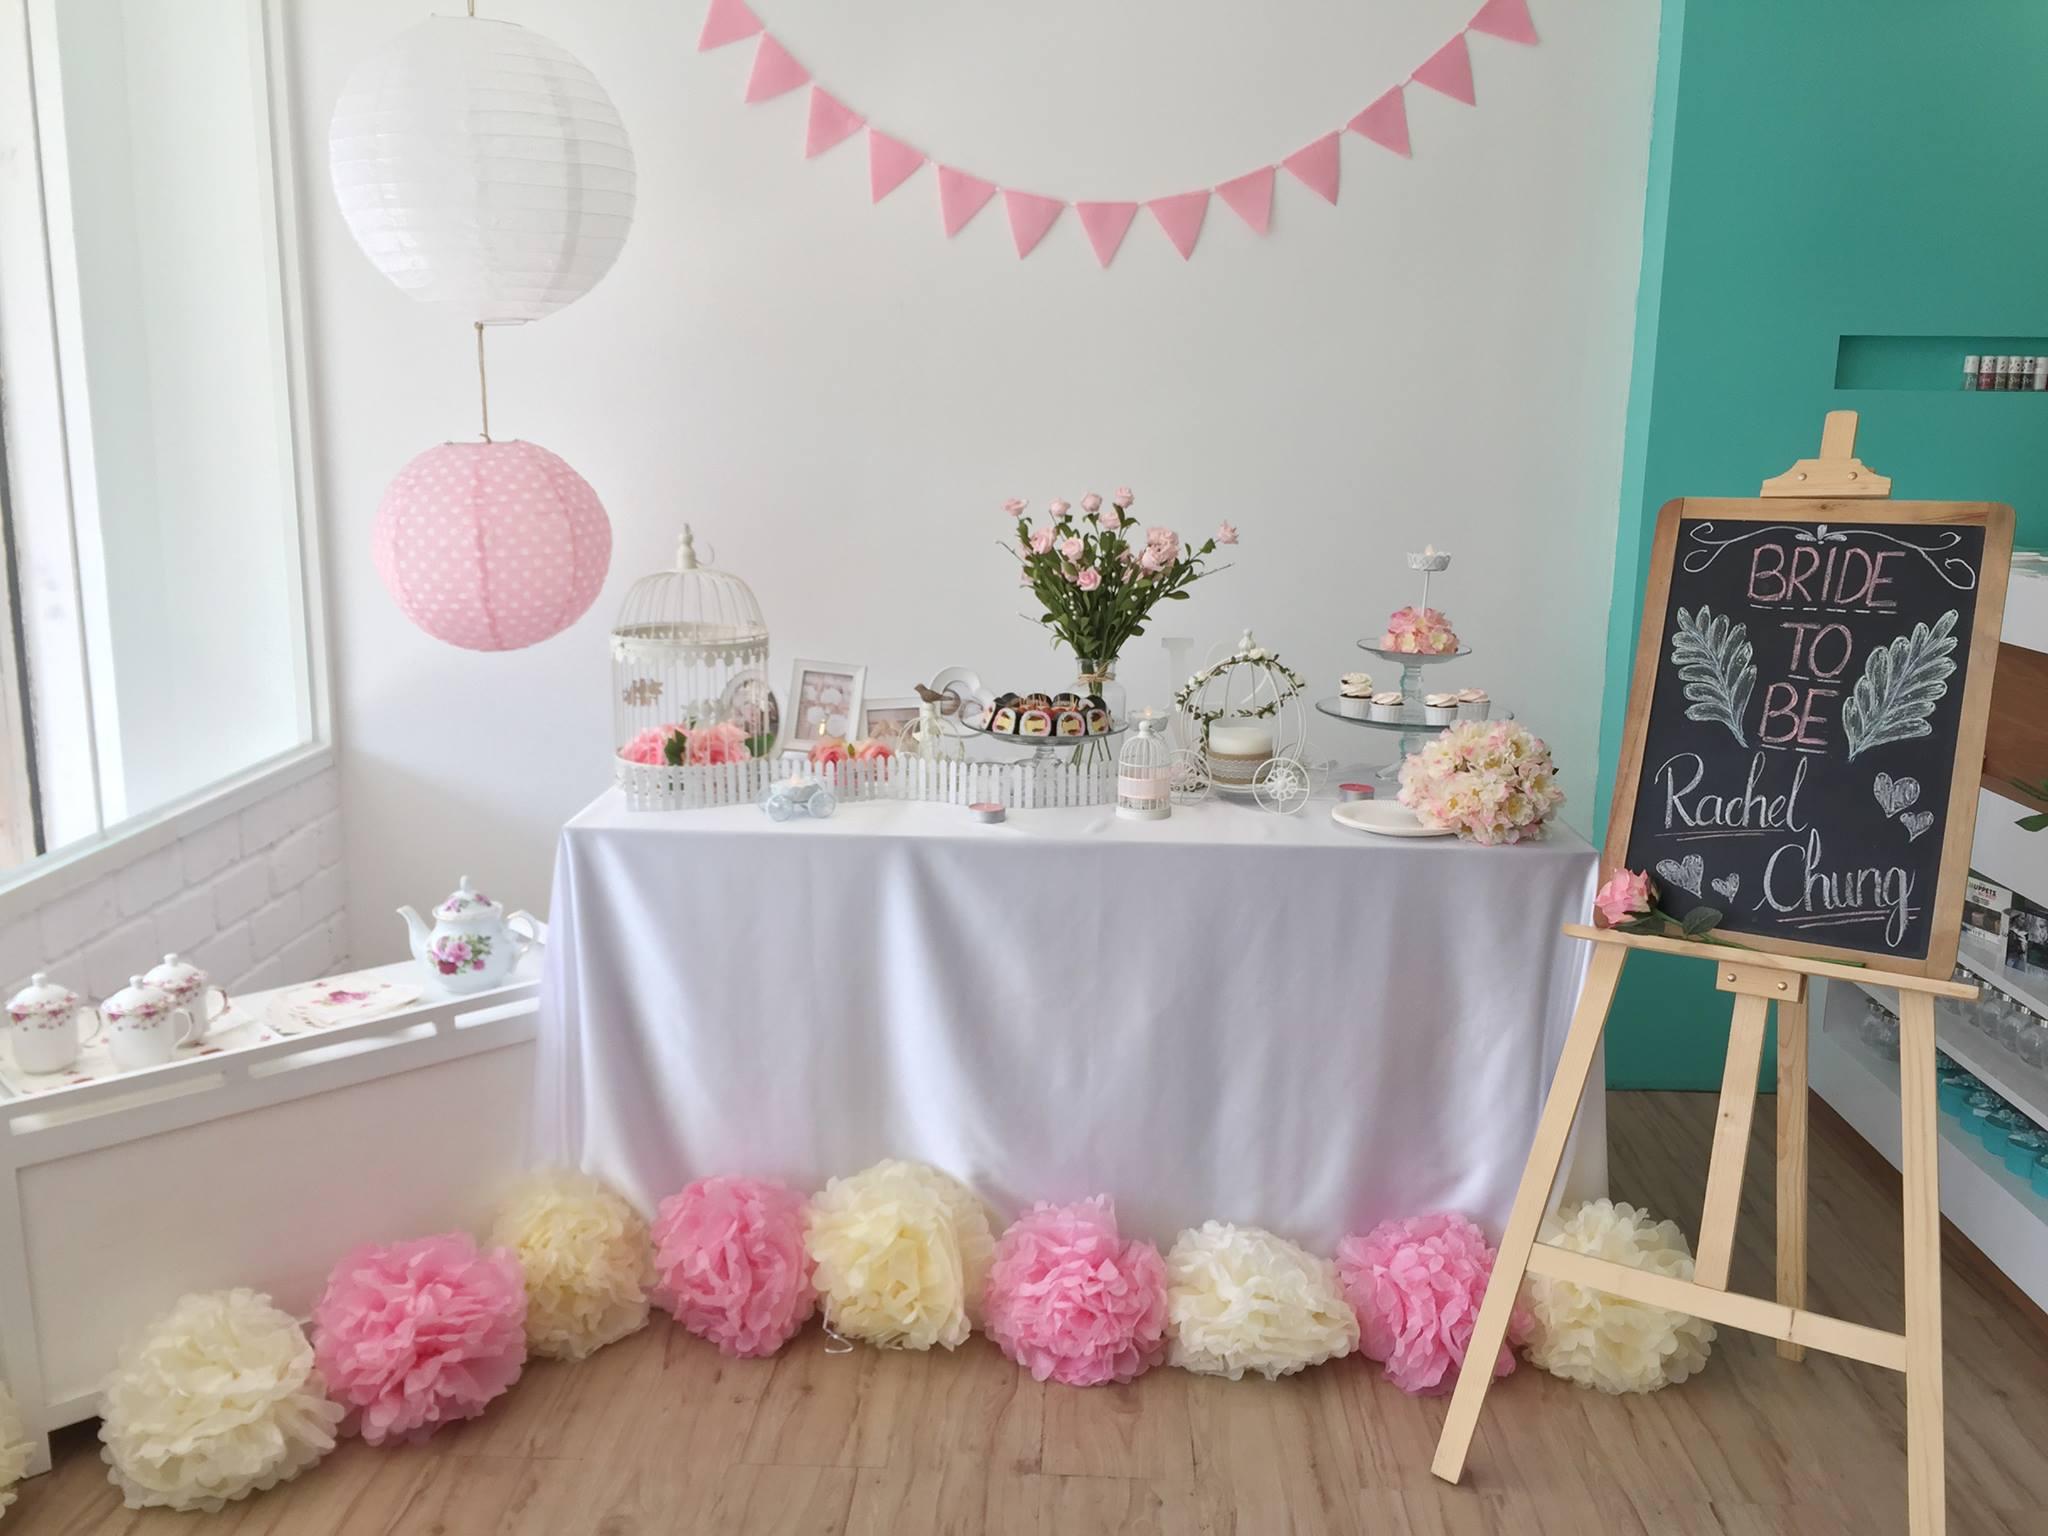 Fine Nail Salon Birthday Party Invitations Model - Invitations ...